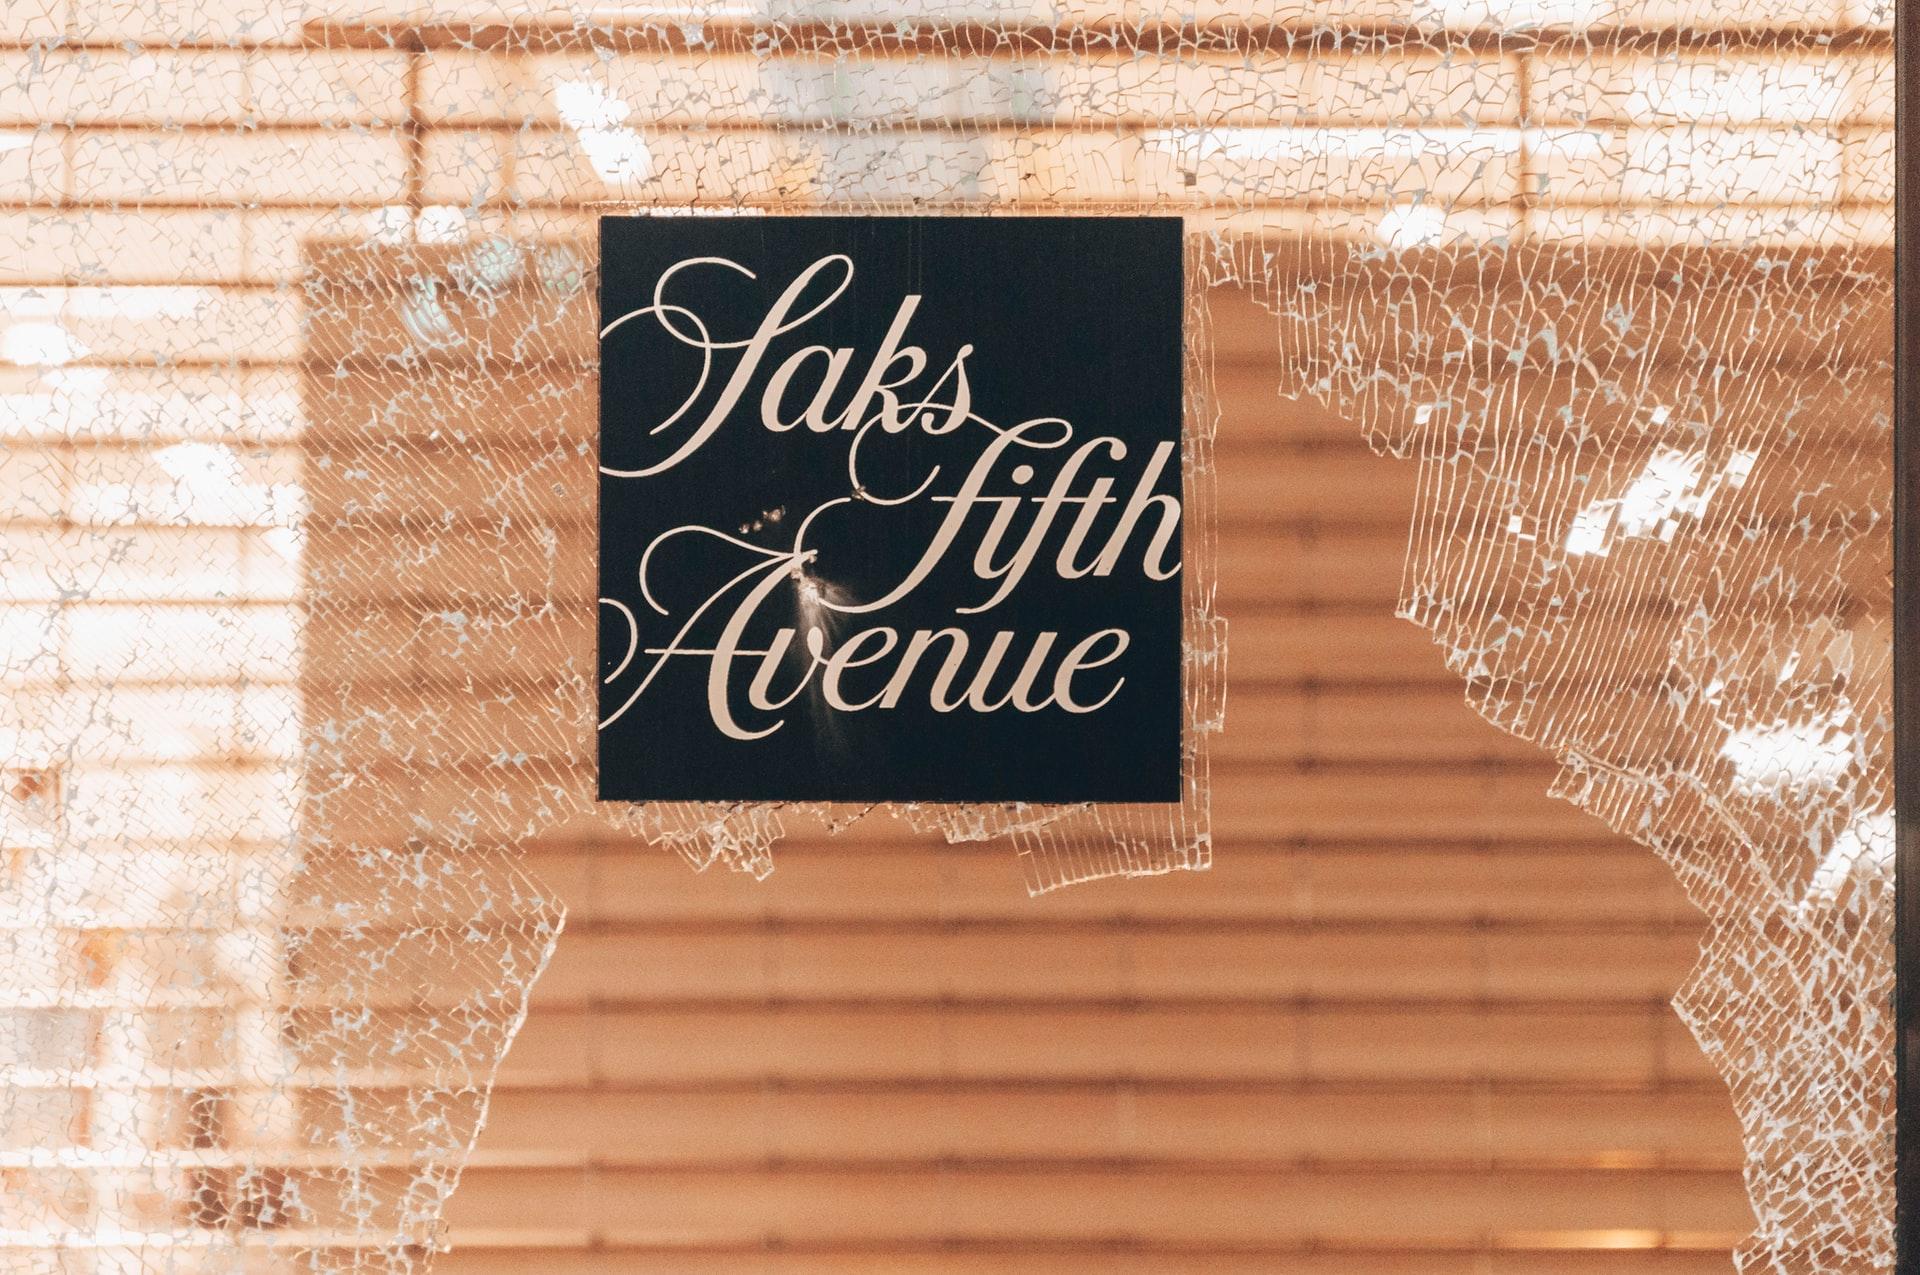 arizona looting laws - saks fifth avenue